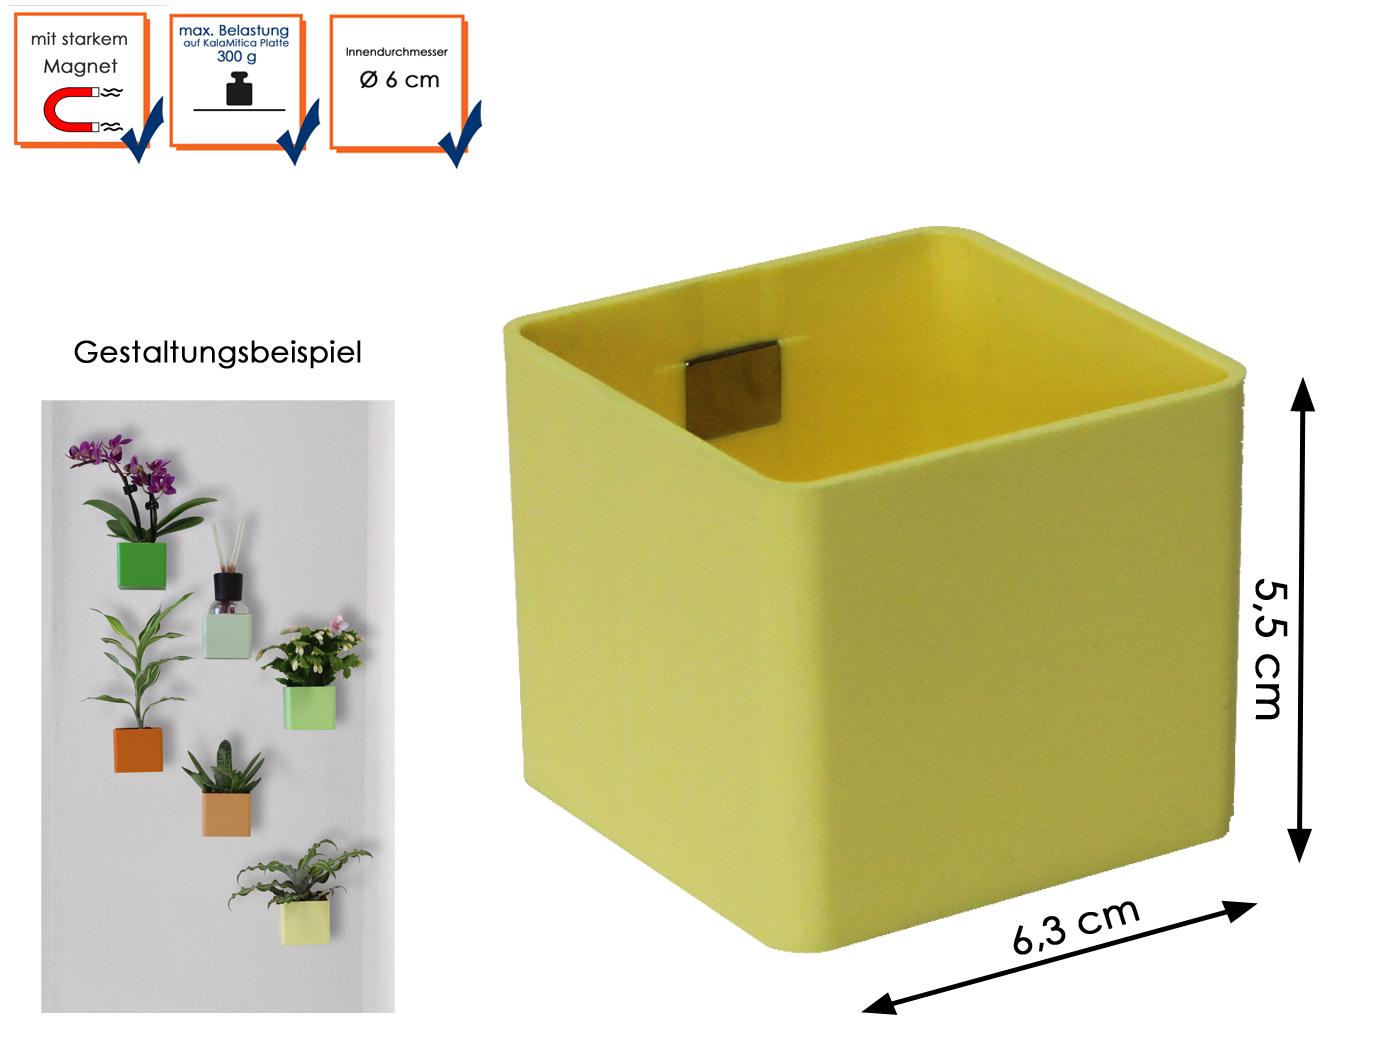 Wandaufbewahrung kunststofftopf avec aimant, mini lanceurs ø 6cm jaune, kalamitica